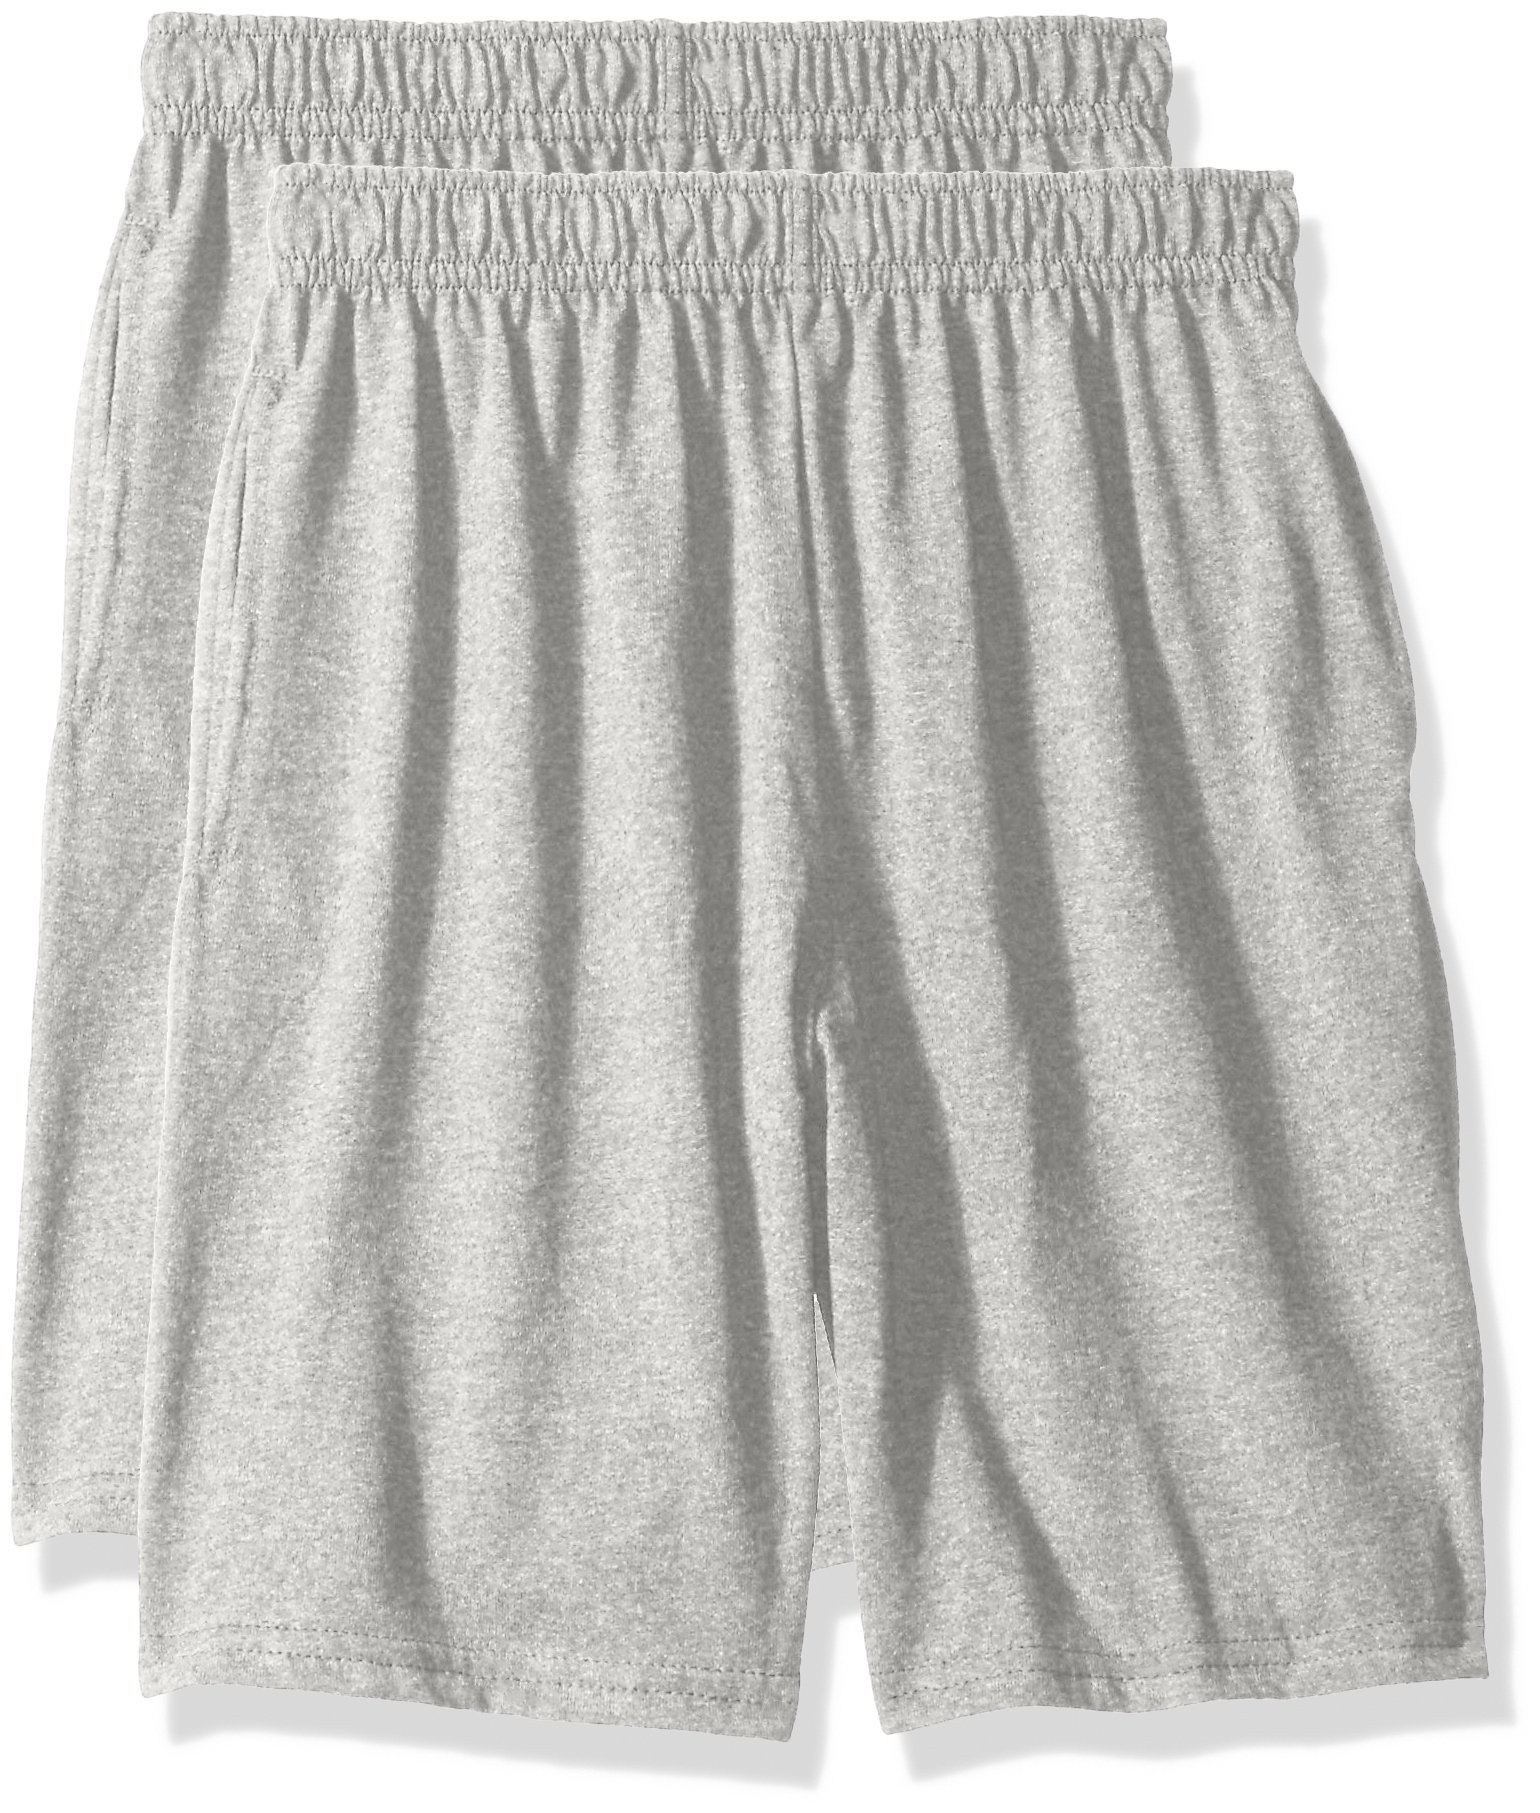 Hanes Big Boys' Jersey Short (Pack of 2), Light Steel, XS